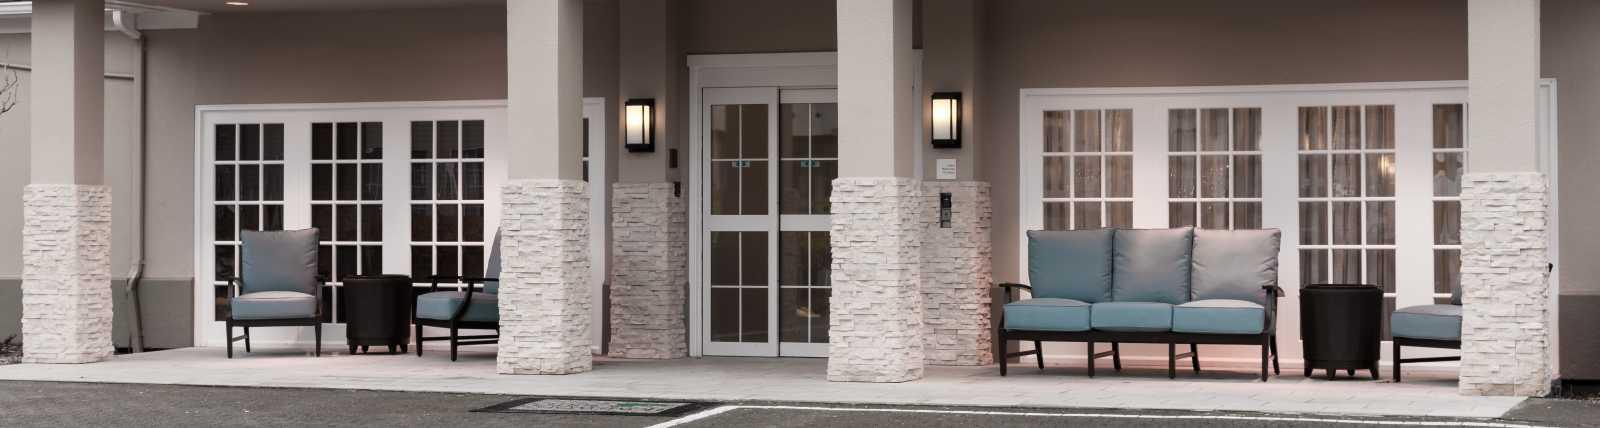 Hotel Main Entrance